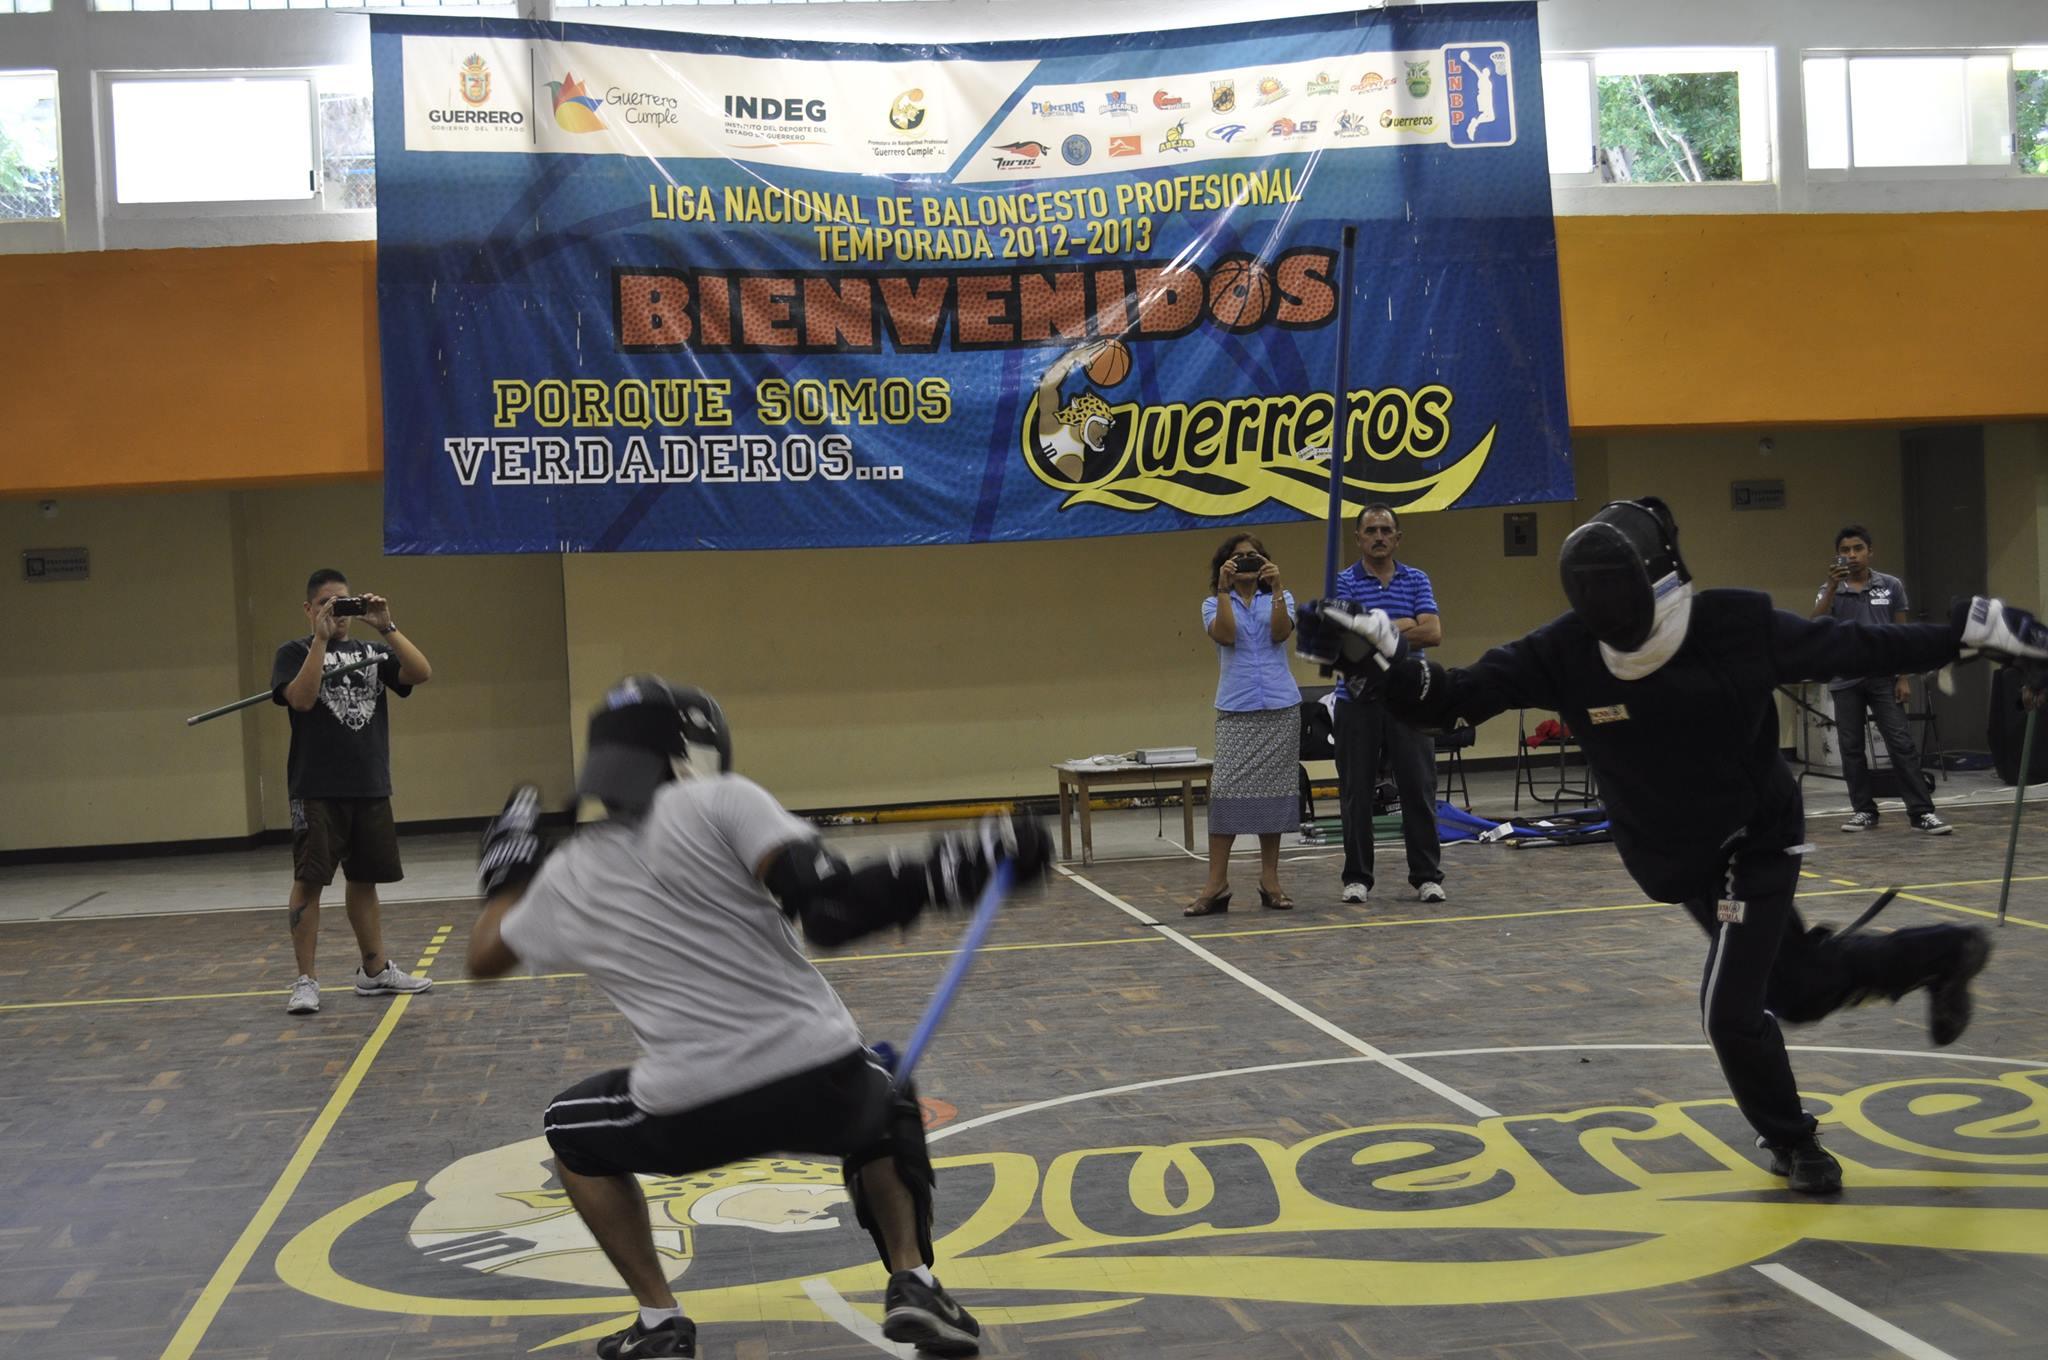 Guerrero, Mexico 2013